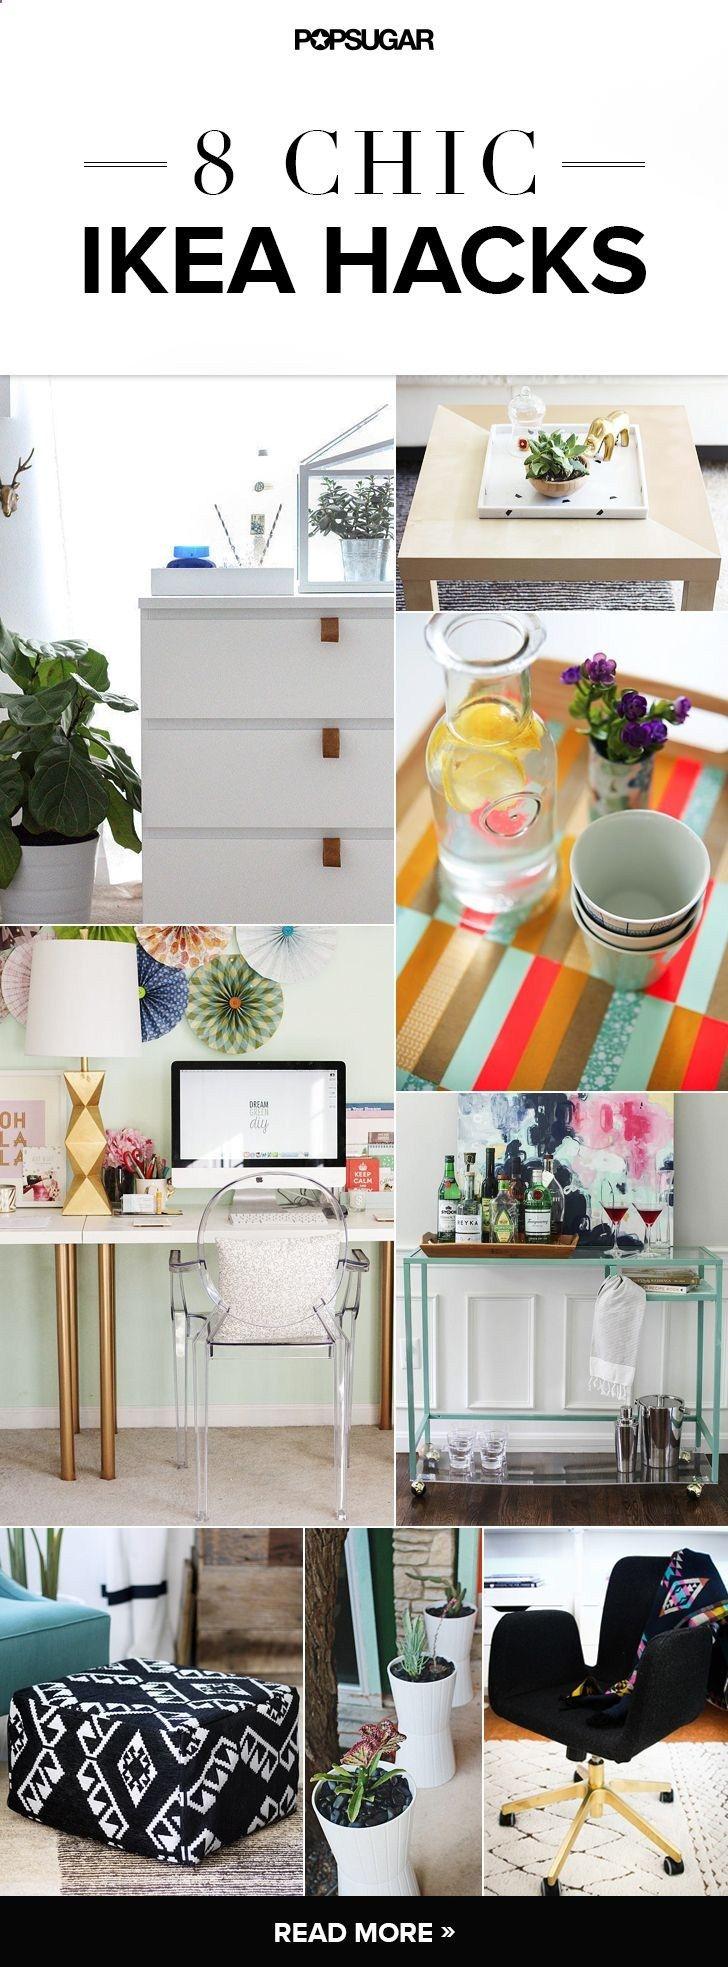 30 Ikea Hacks That Look Shockingly Expensive | Home decor ...